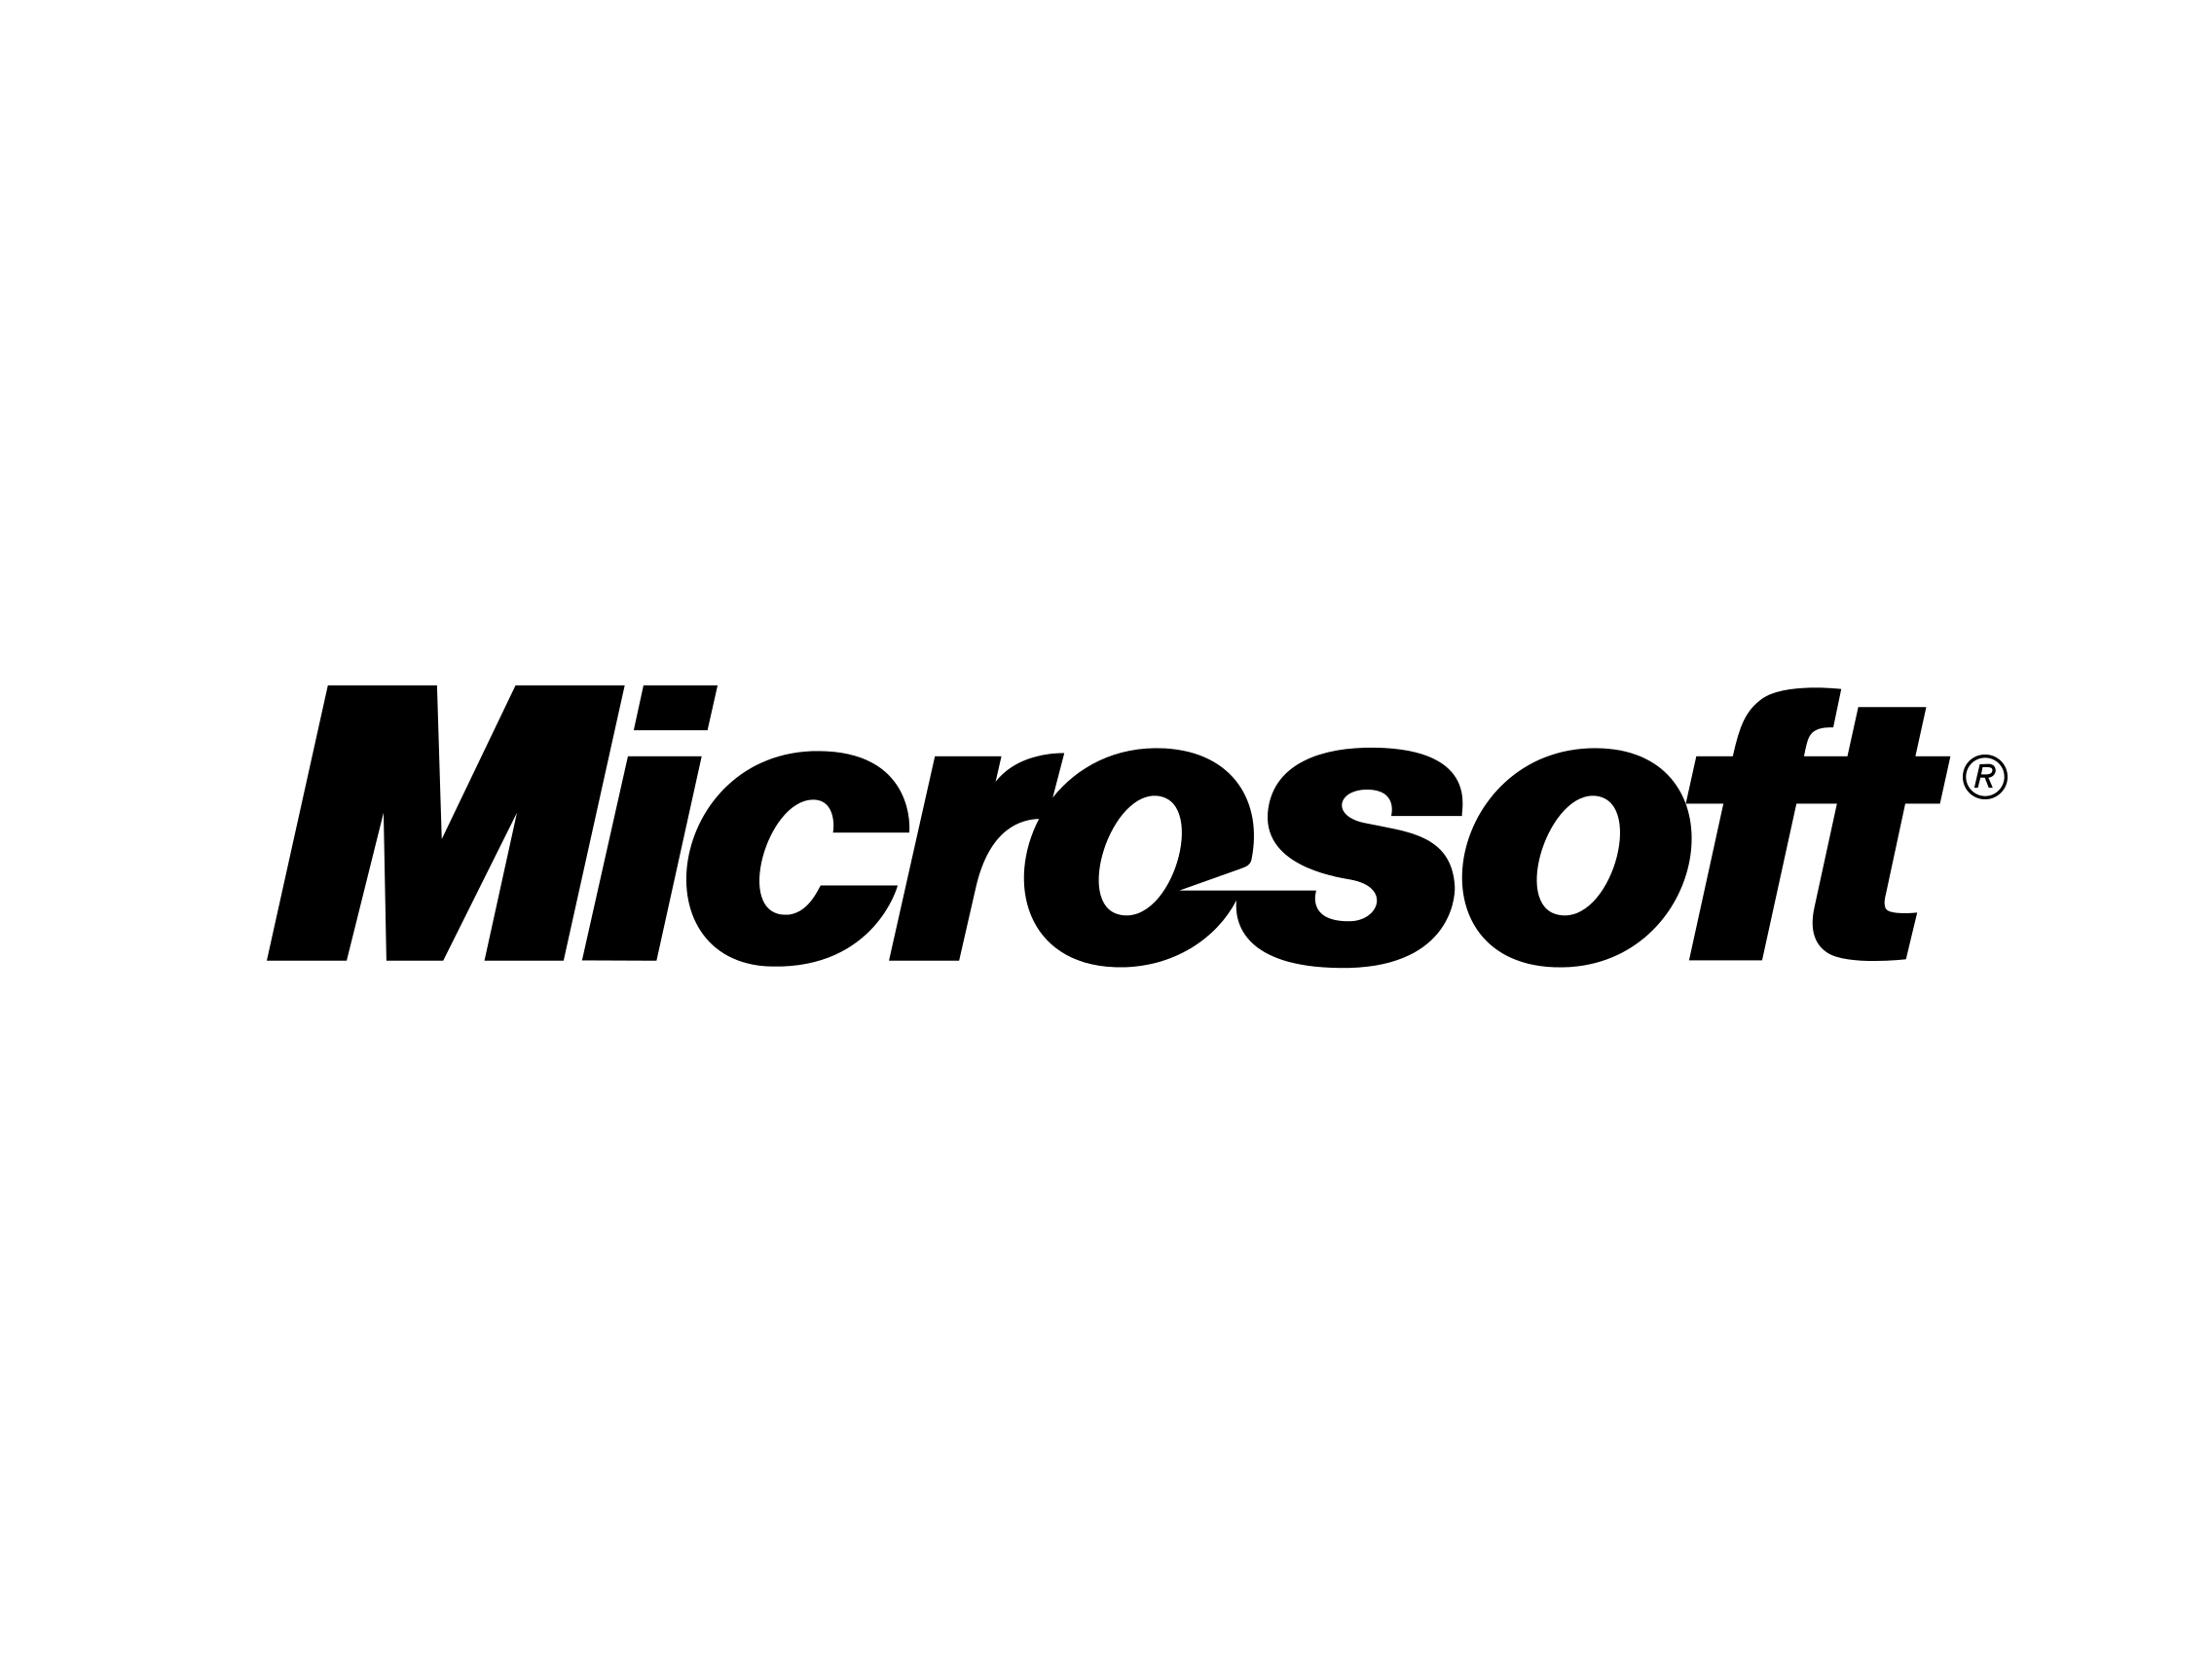 microsoft-text-logo-png-17